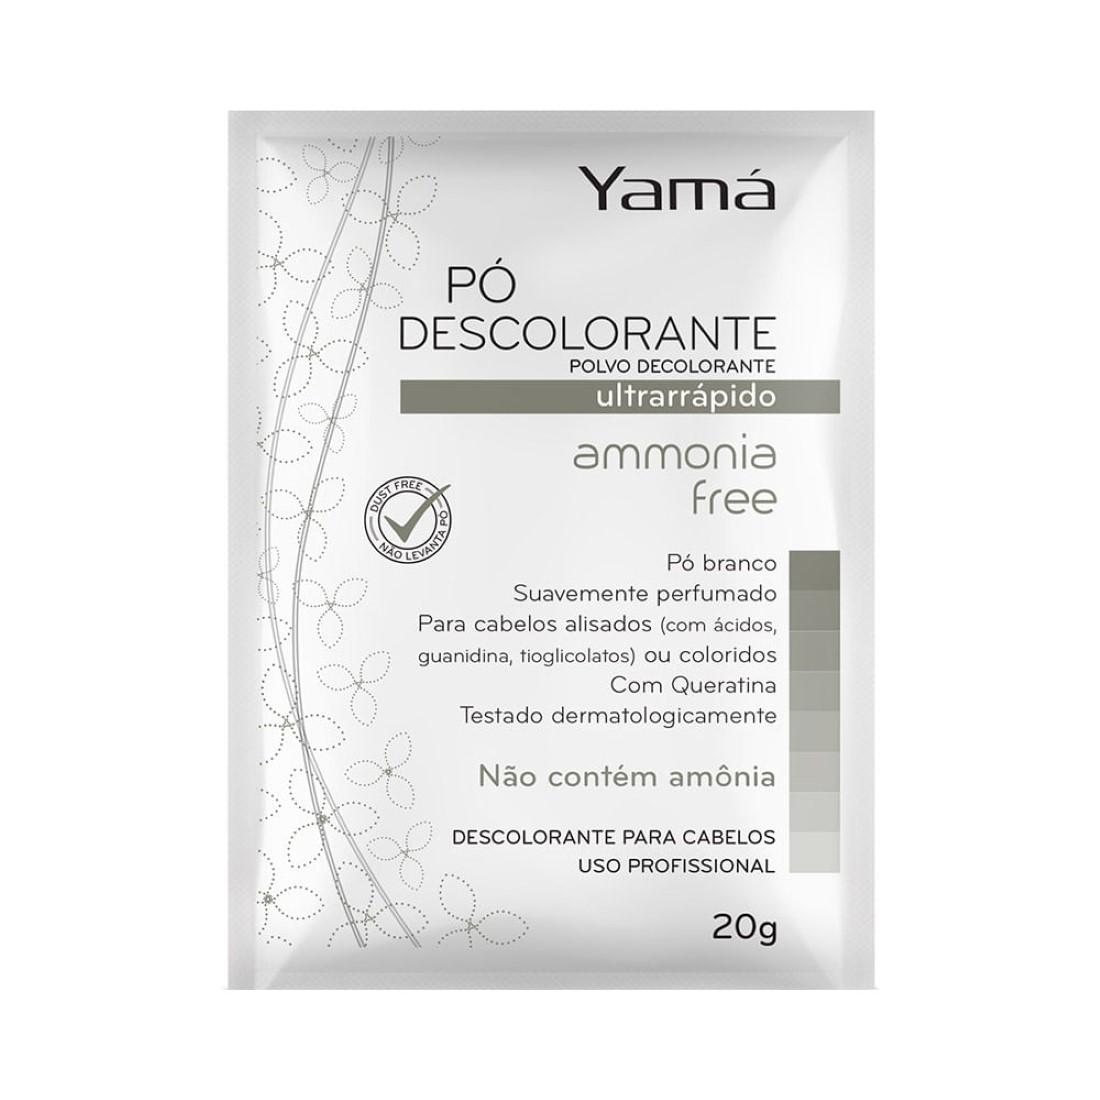 Pó Descolorante Ultra Rápido Ammonia Free 20g - Yamá